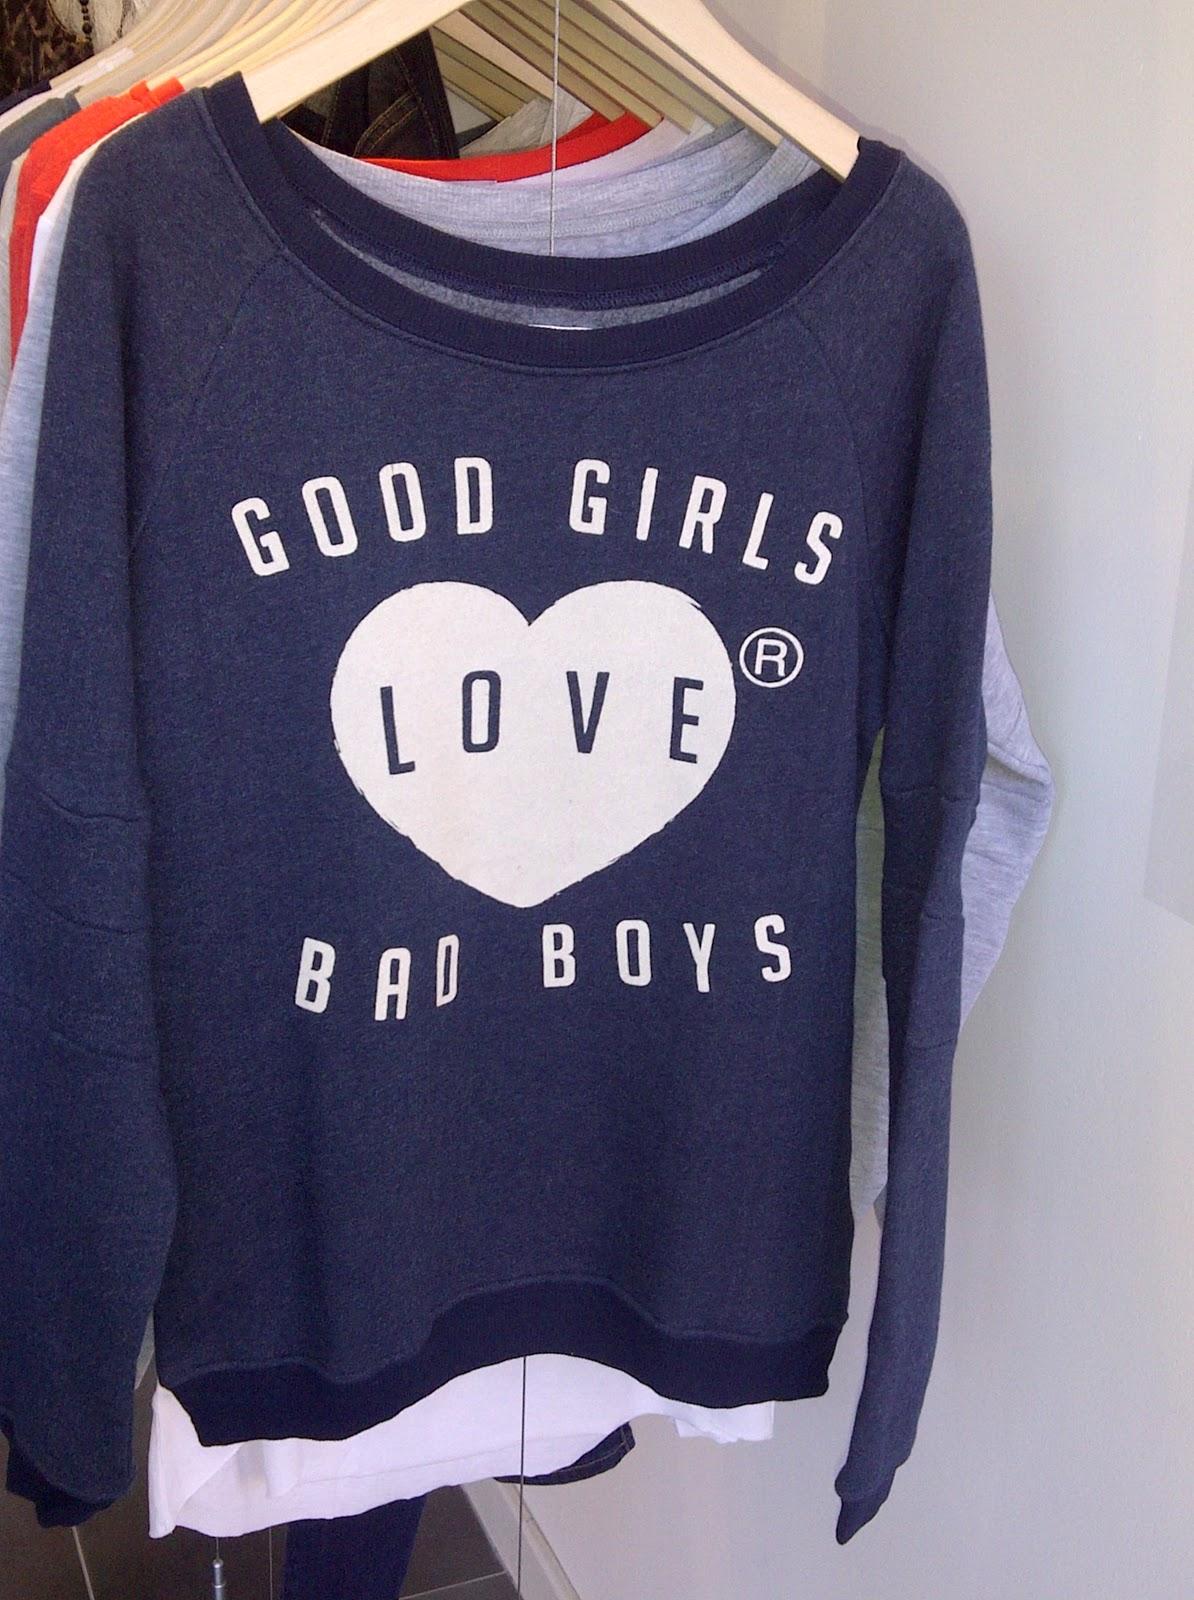 Good Girls Love Bad Boys Tumblr | www.imgkid.com - The ...